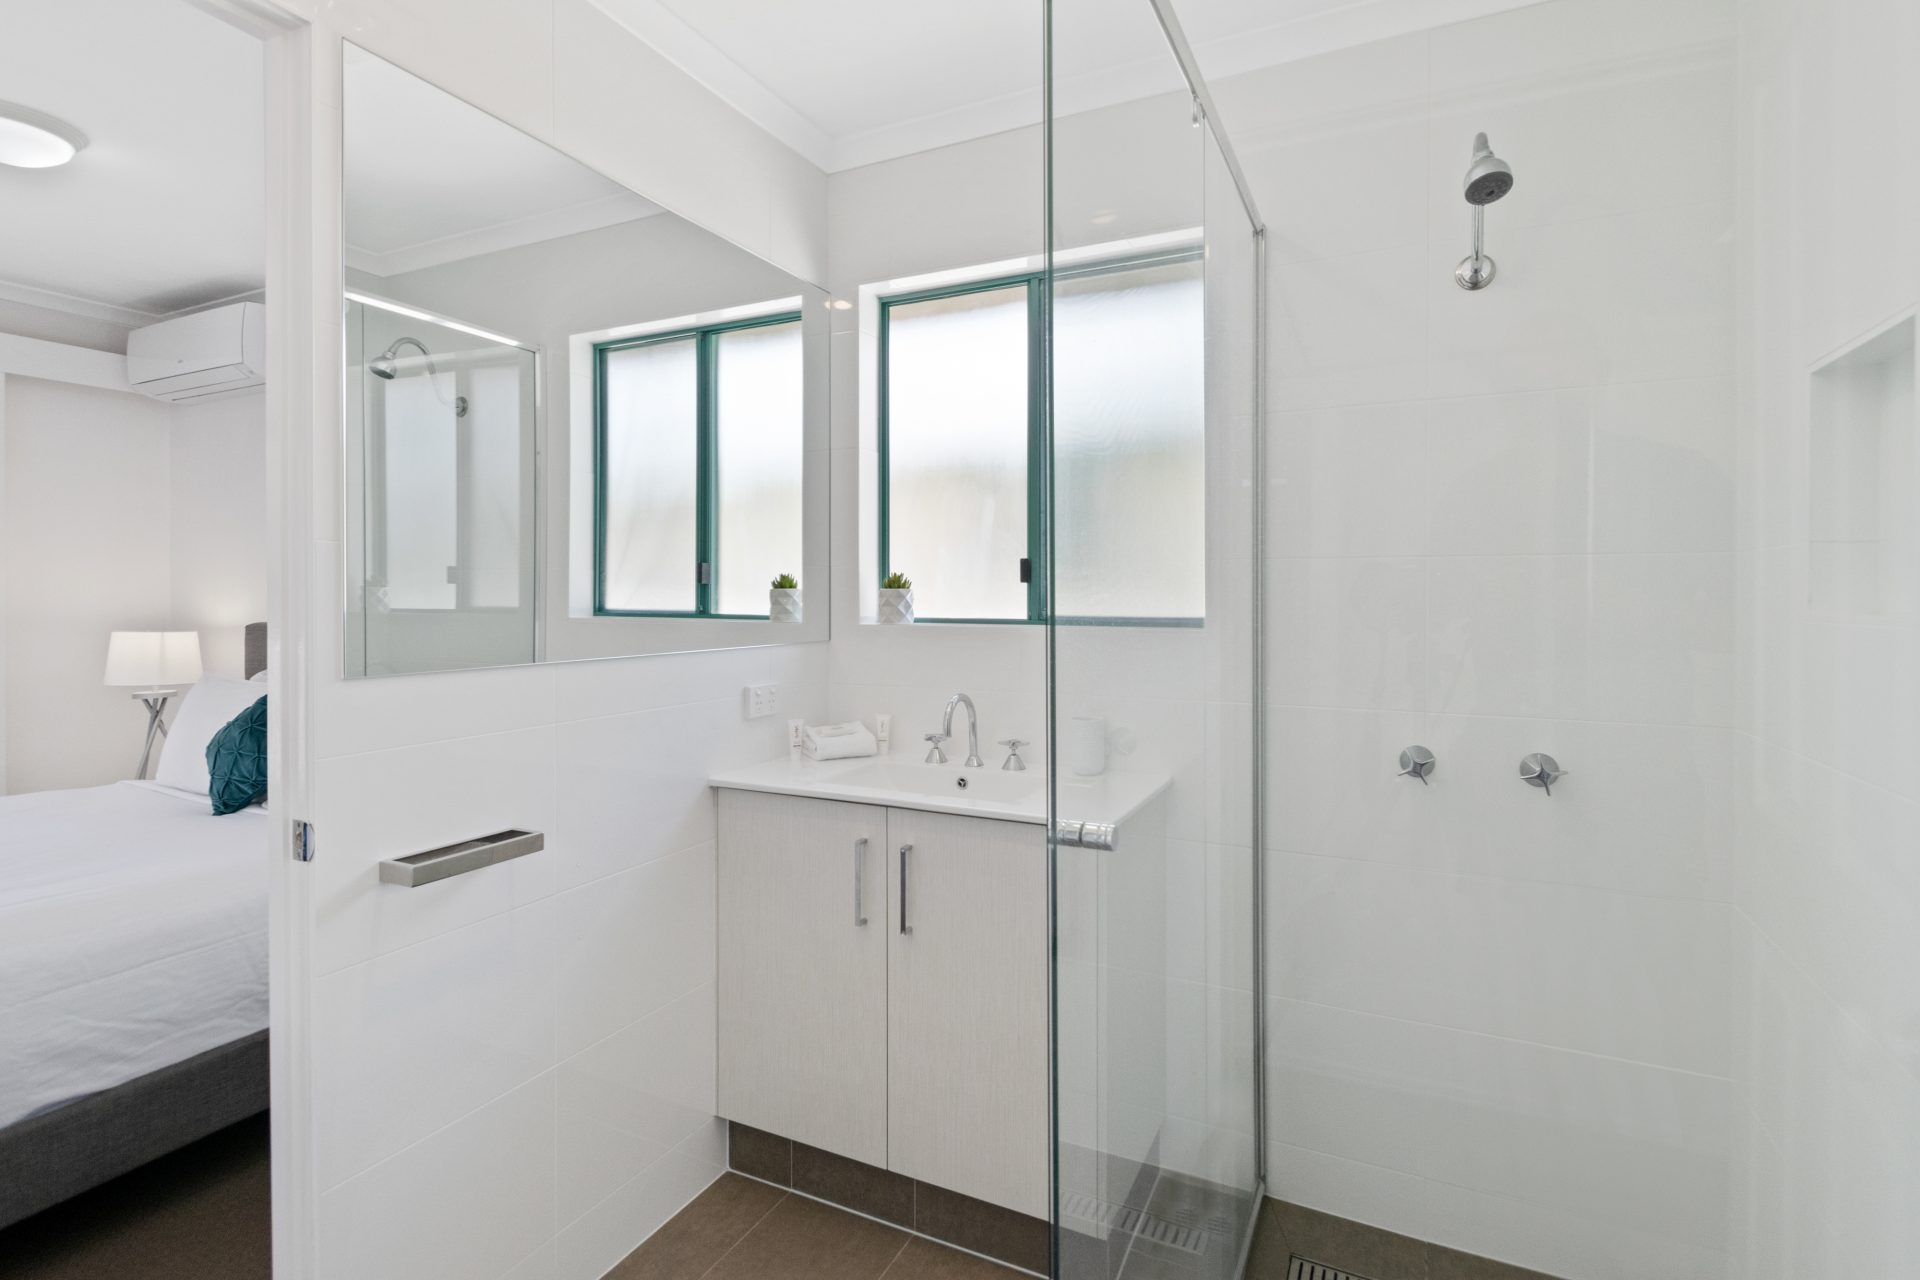 Terrapin 2 Bedroom Superior Apartment - Unit 07